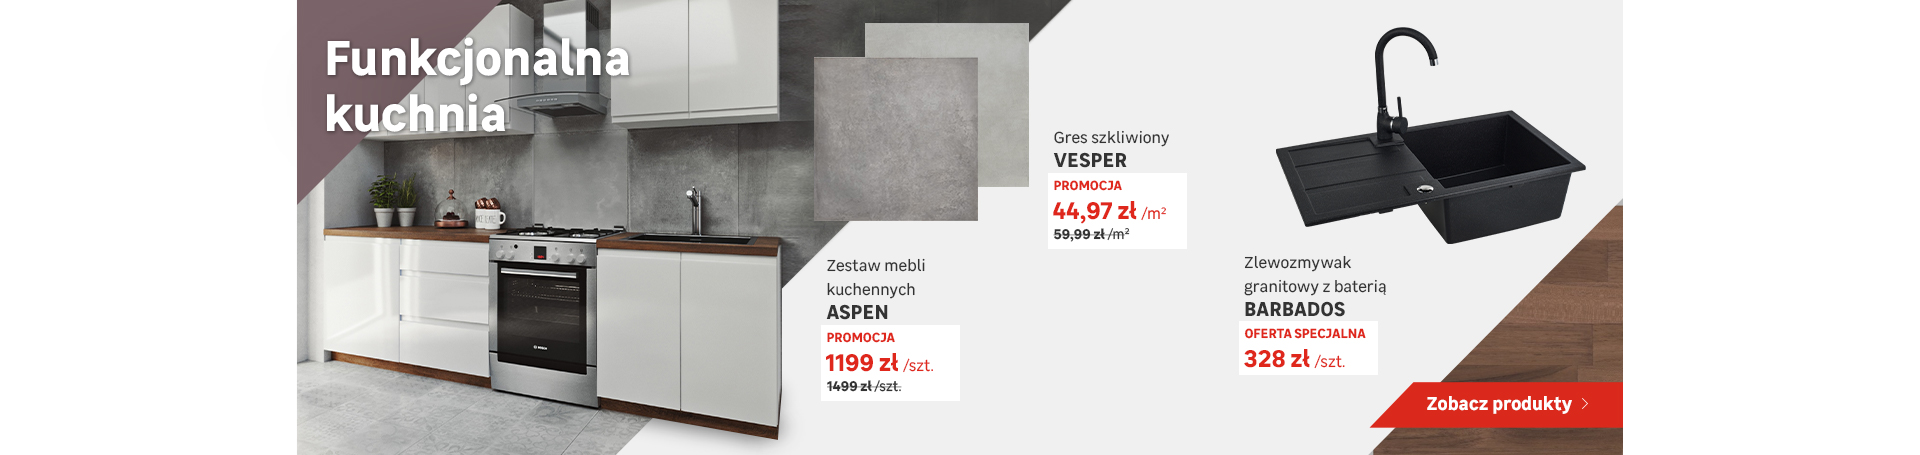 ps-kuchnie-20.01-09.02.2021-1920x455